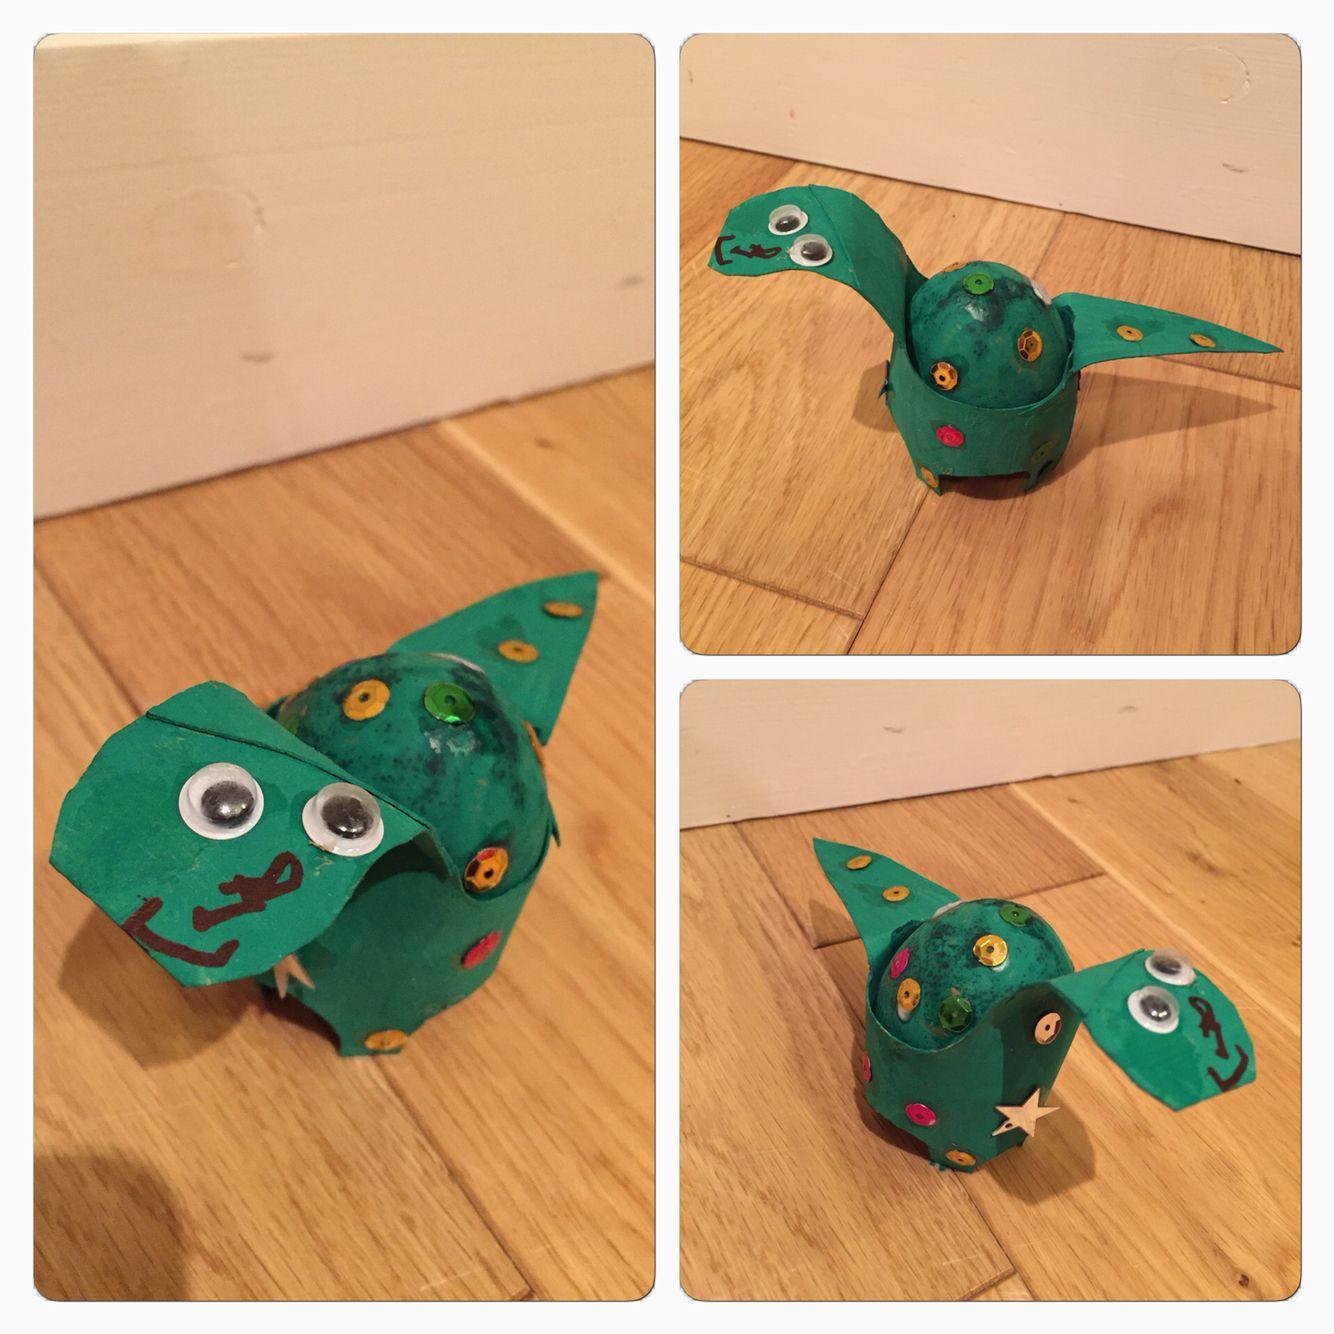 dinosaur easter egg decoration my little man made for his nursery